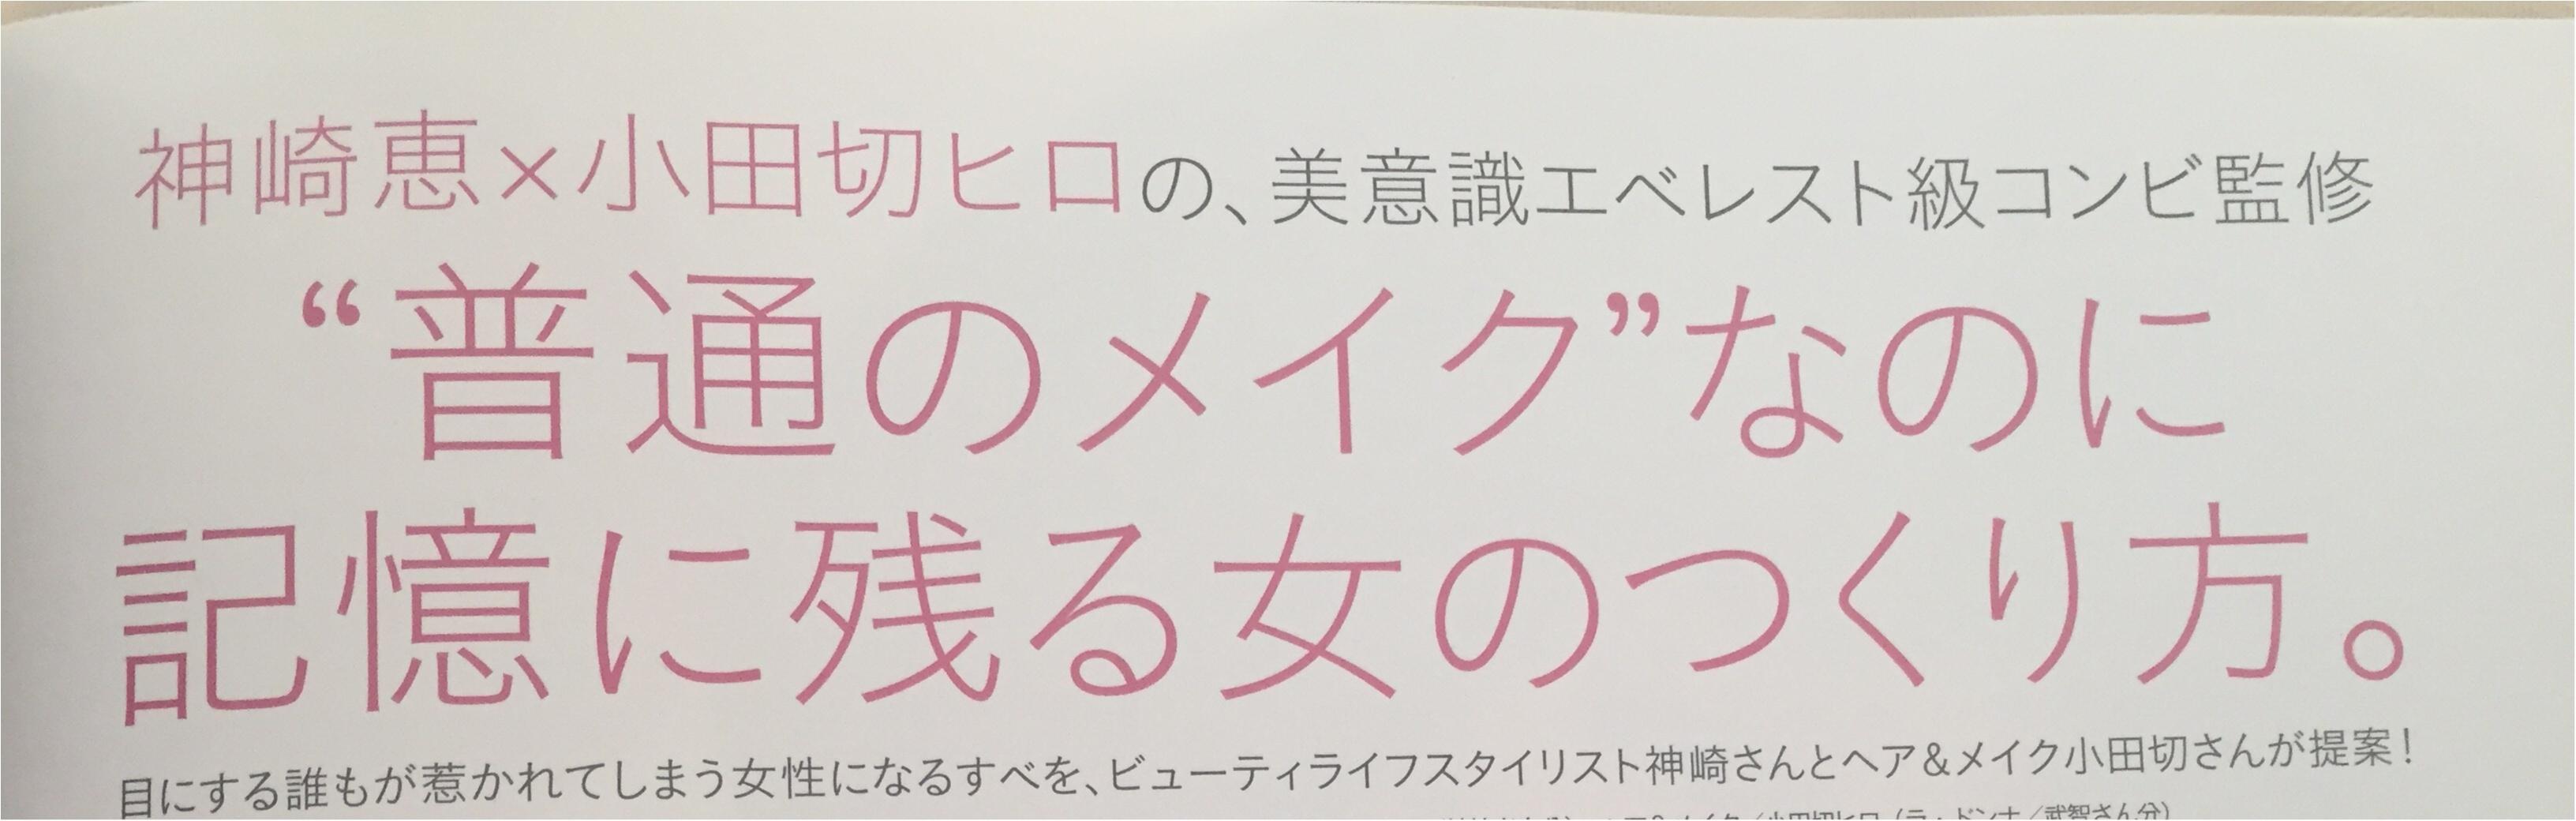 【MORE12月号☆発売中】特別付録はCOACHステーショナリー4点セット✨≪samenyan≫_11